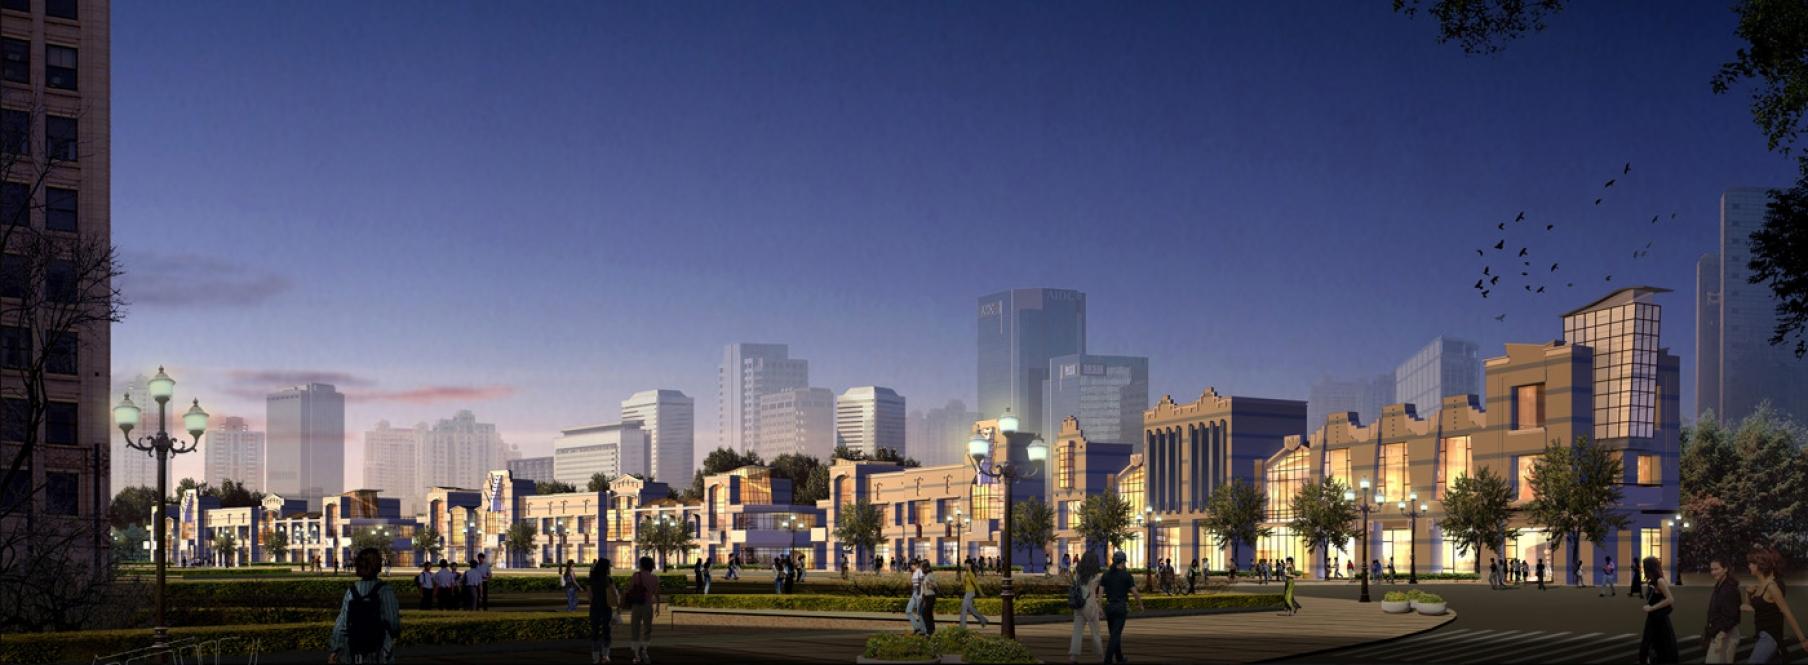 Shanghai Huangpu Old Town Reformation